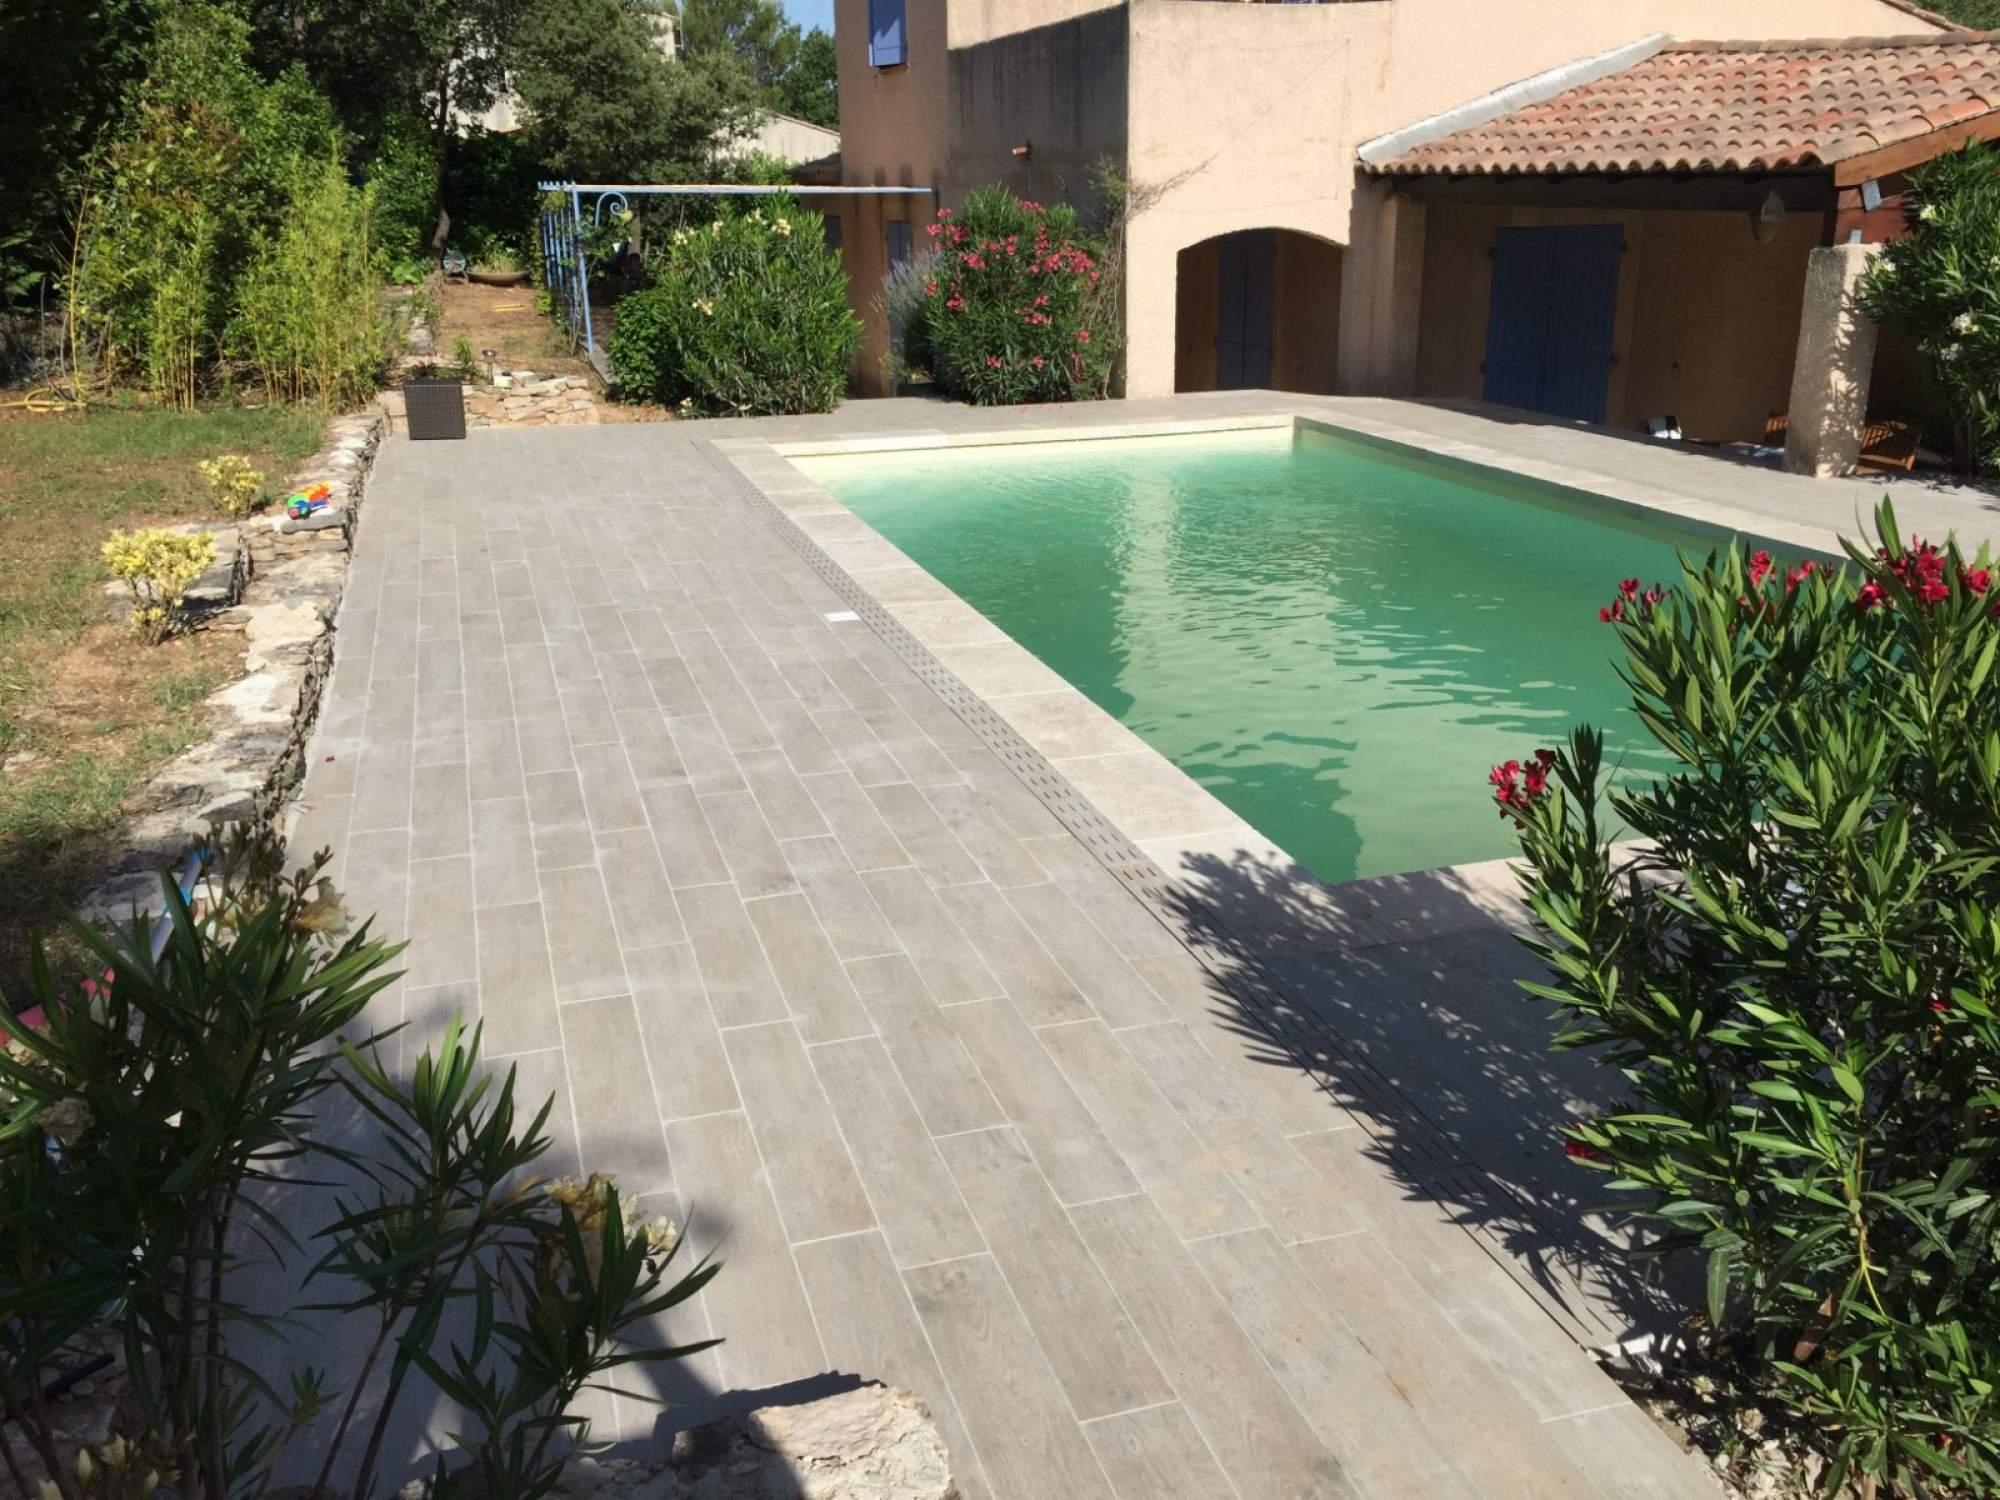 Carrelage imitation bois pour terrasse piscine veranda